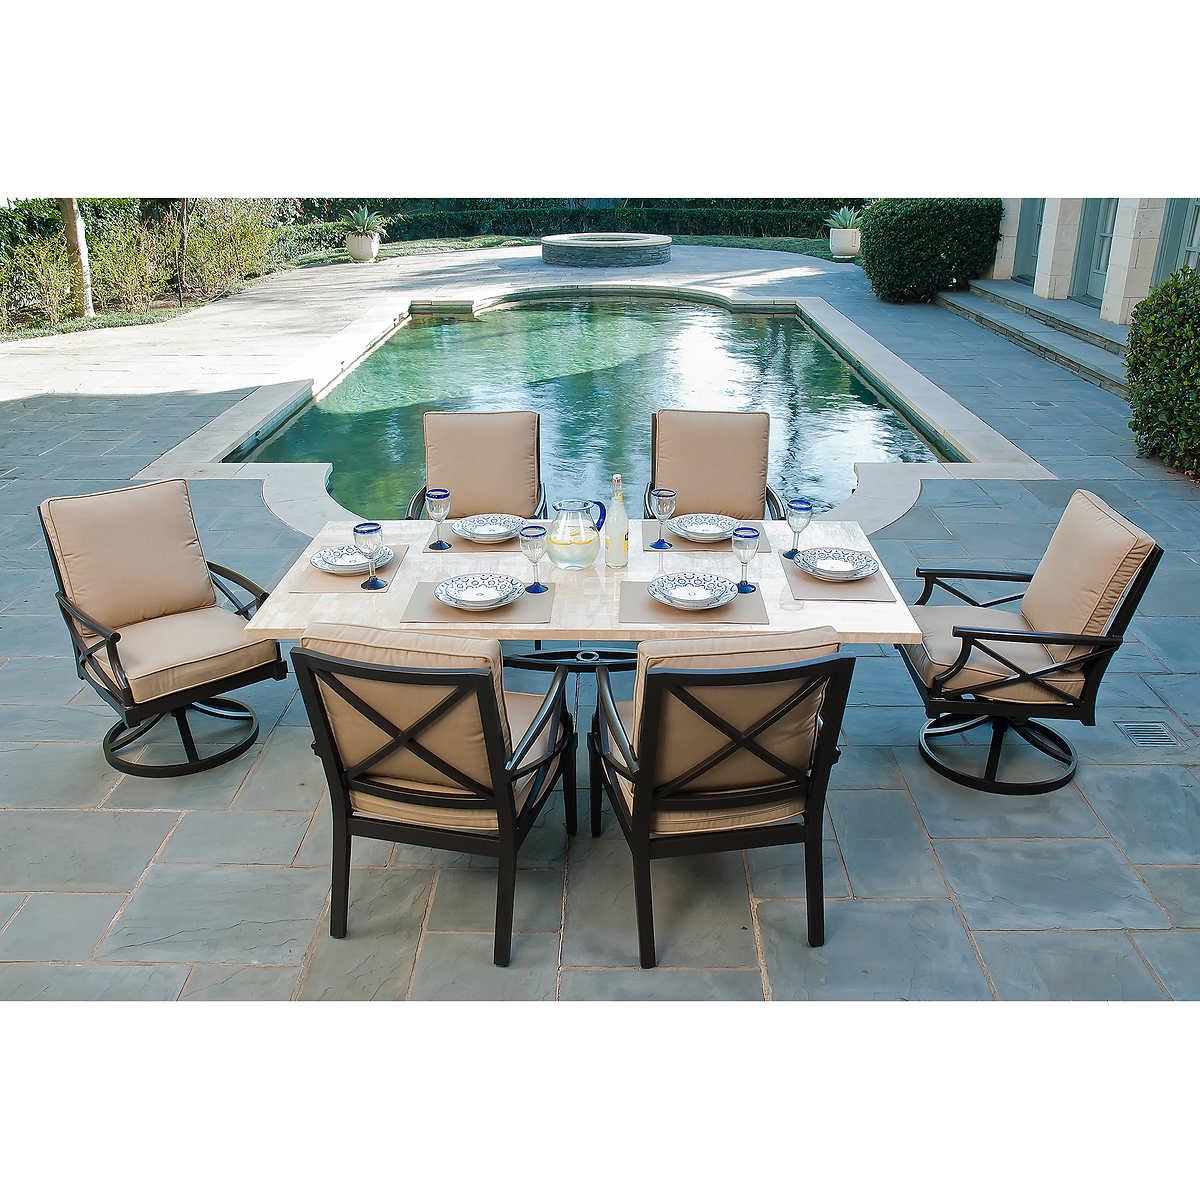 Patio furniture sets costco - Travers 7 Piece Patio Dining Set